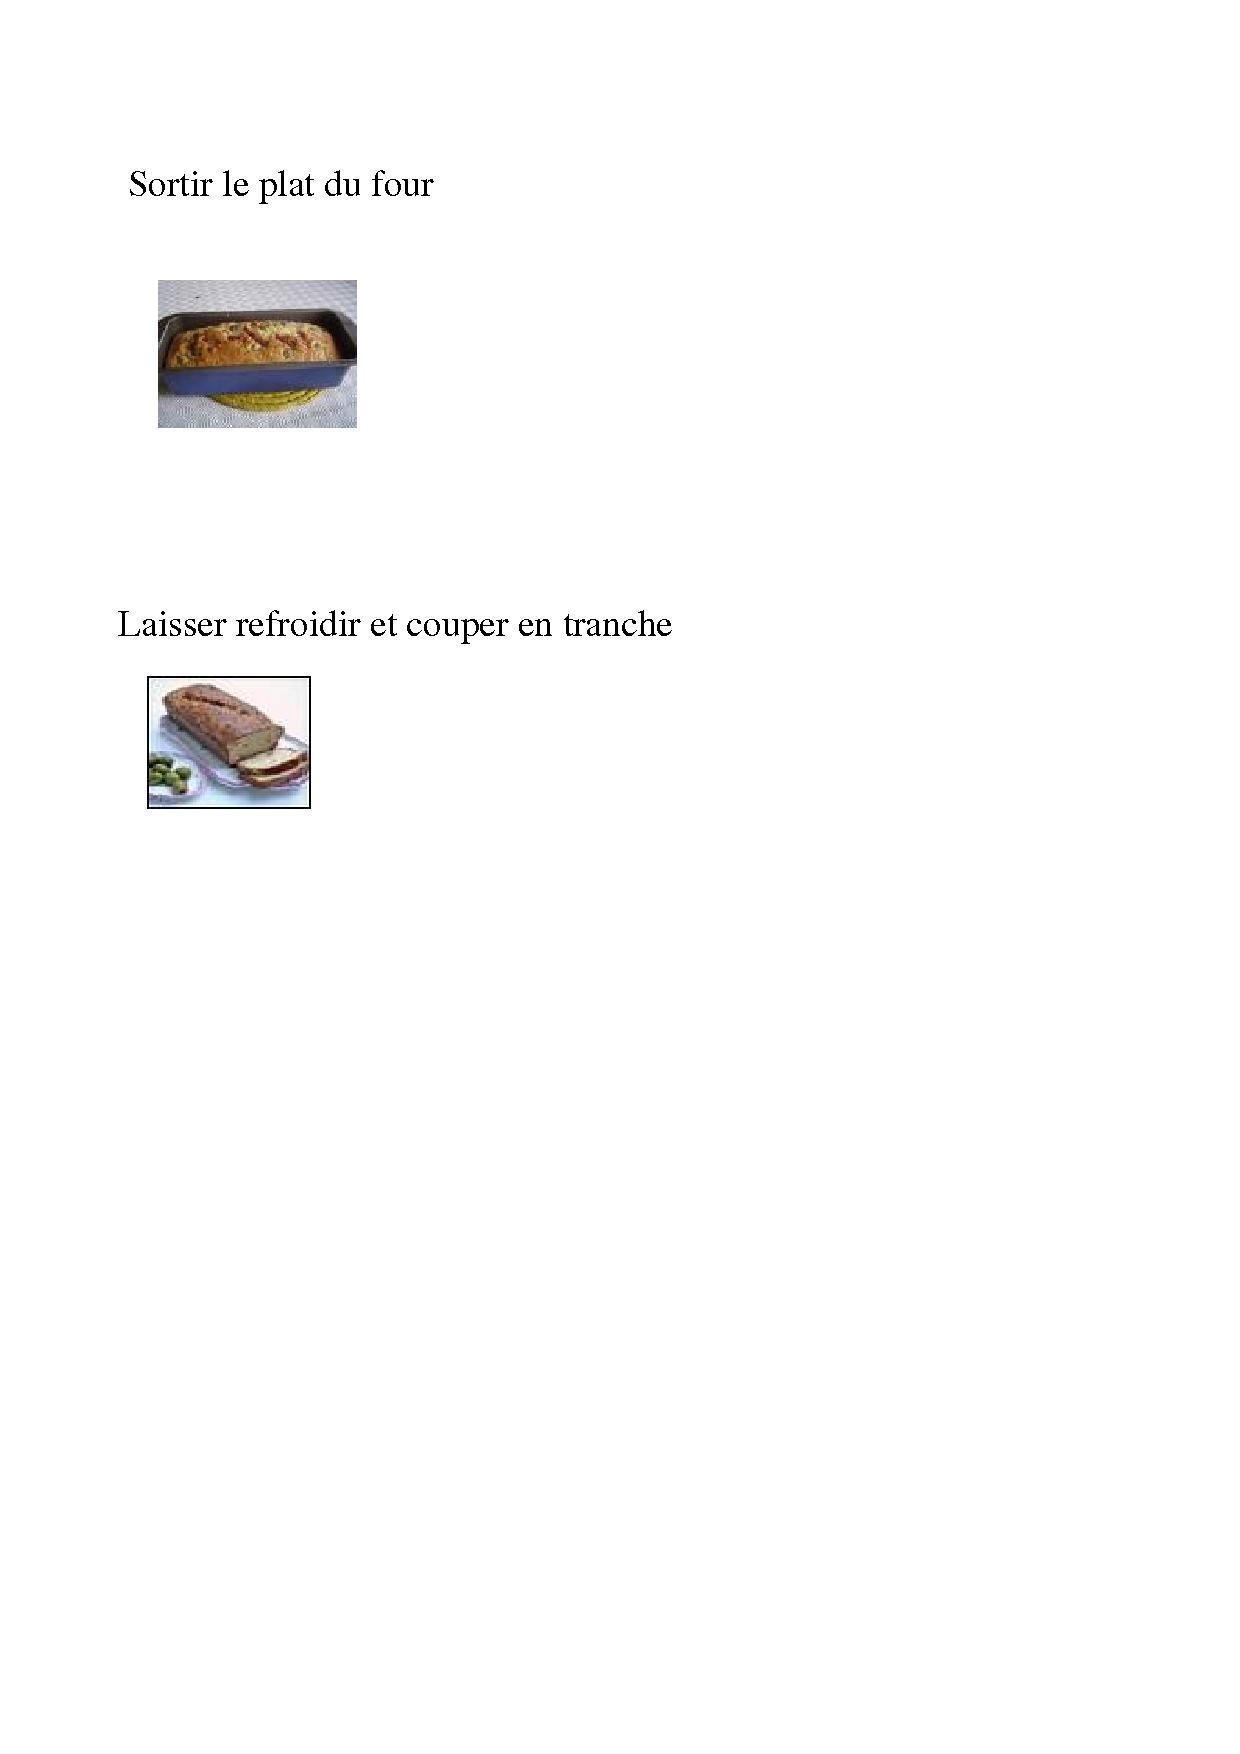 recettecake5pd4.jpg